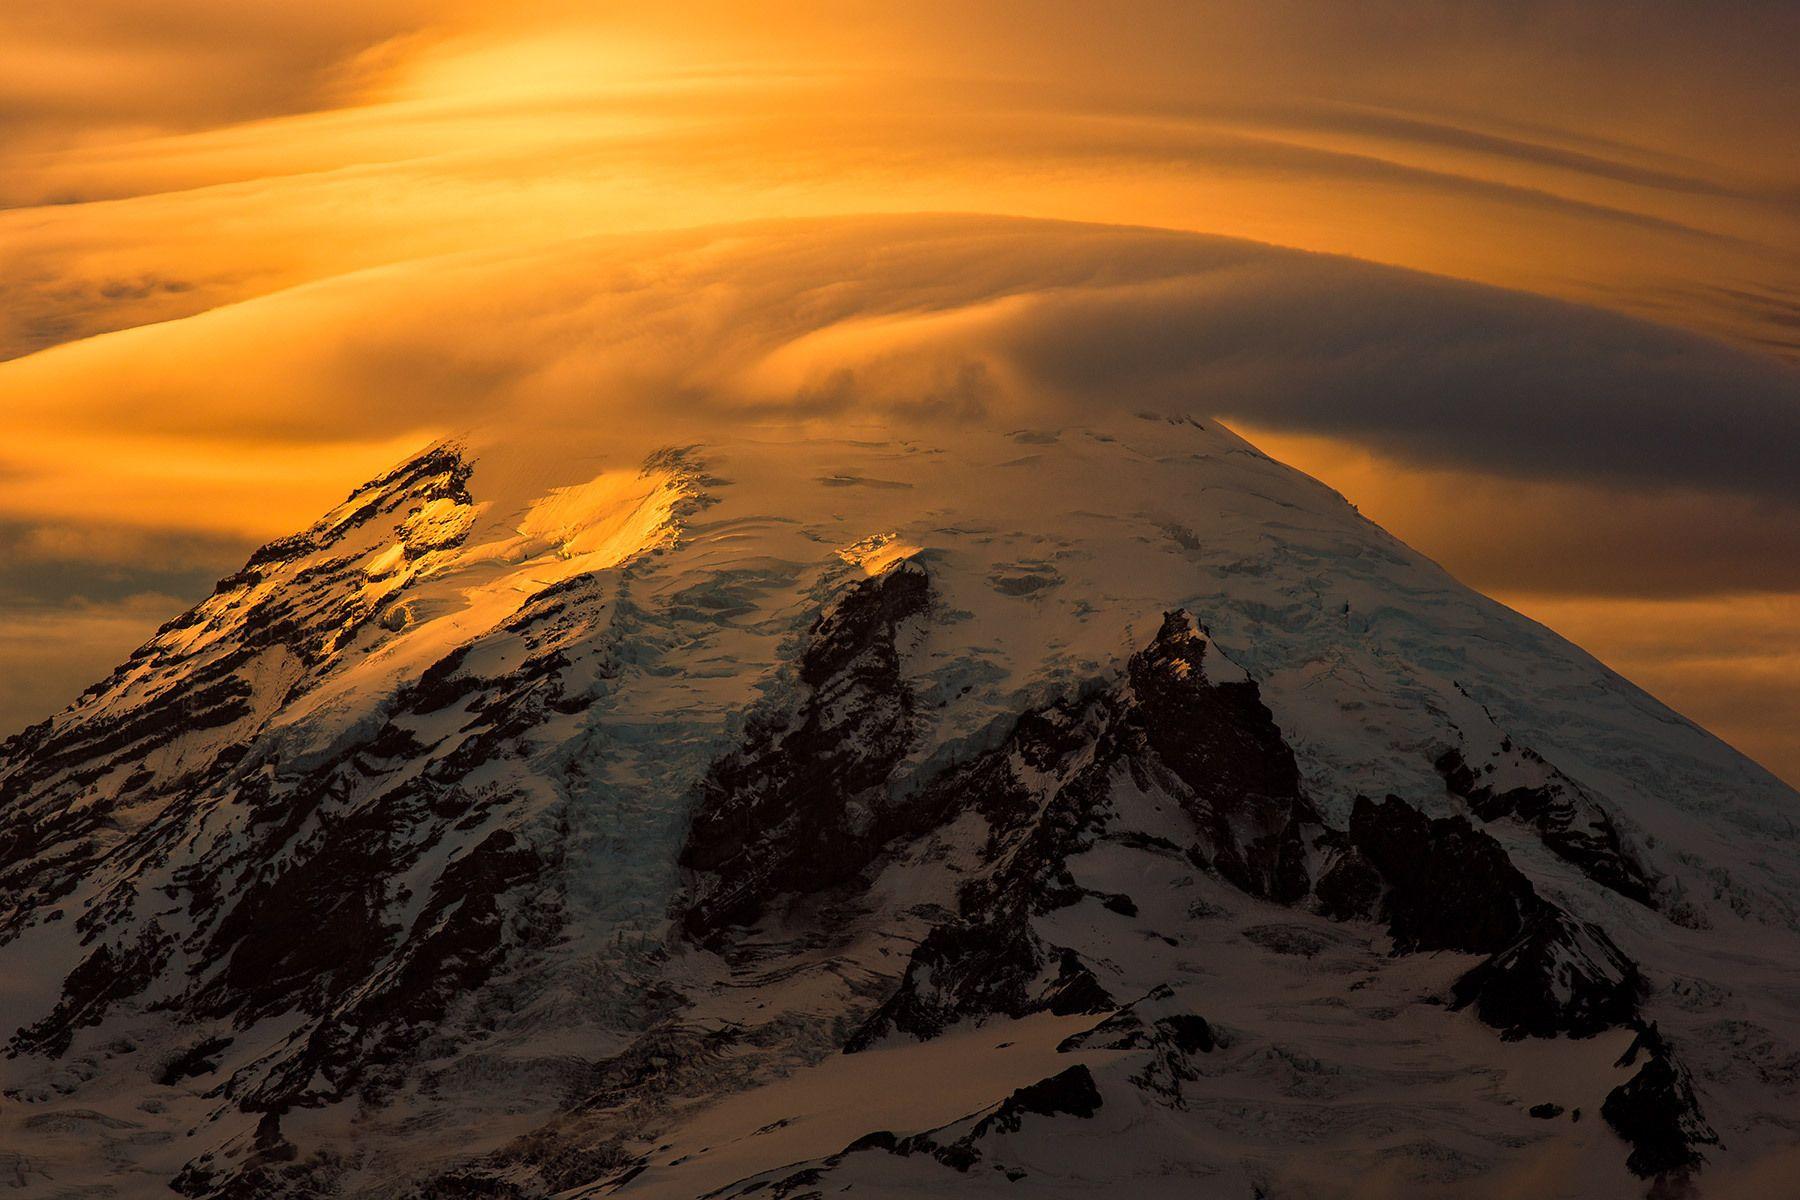 Lenticular Cloud, Mt. Rainer, Washington